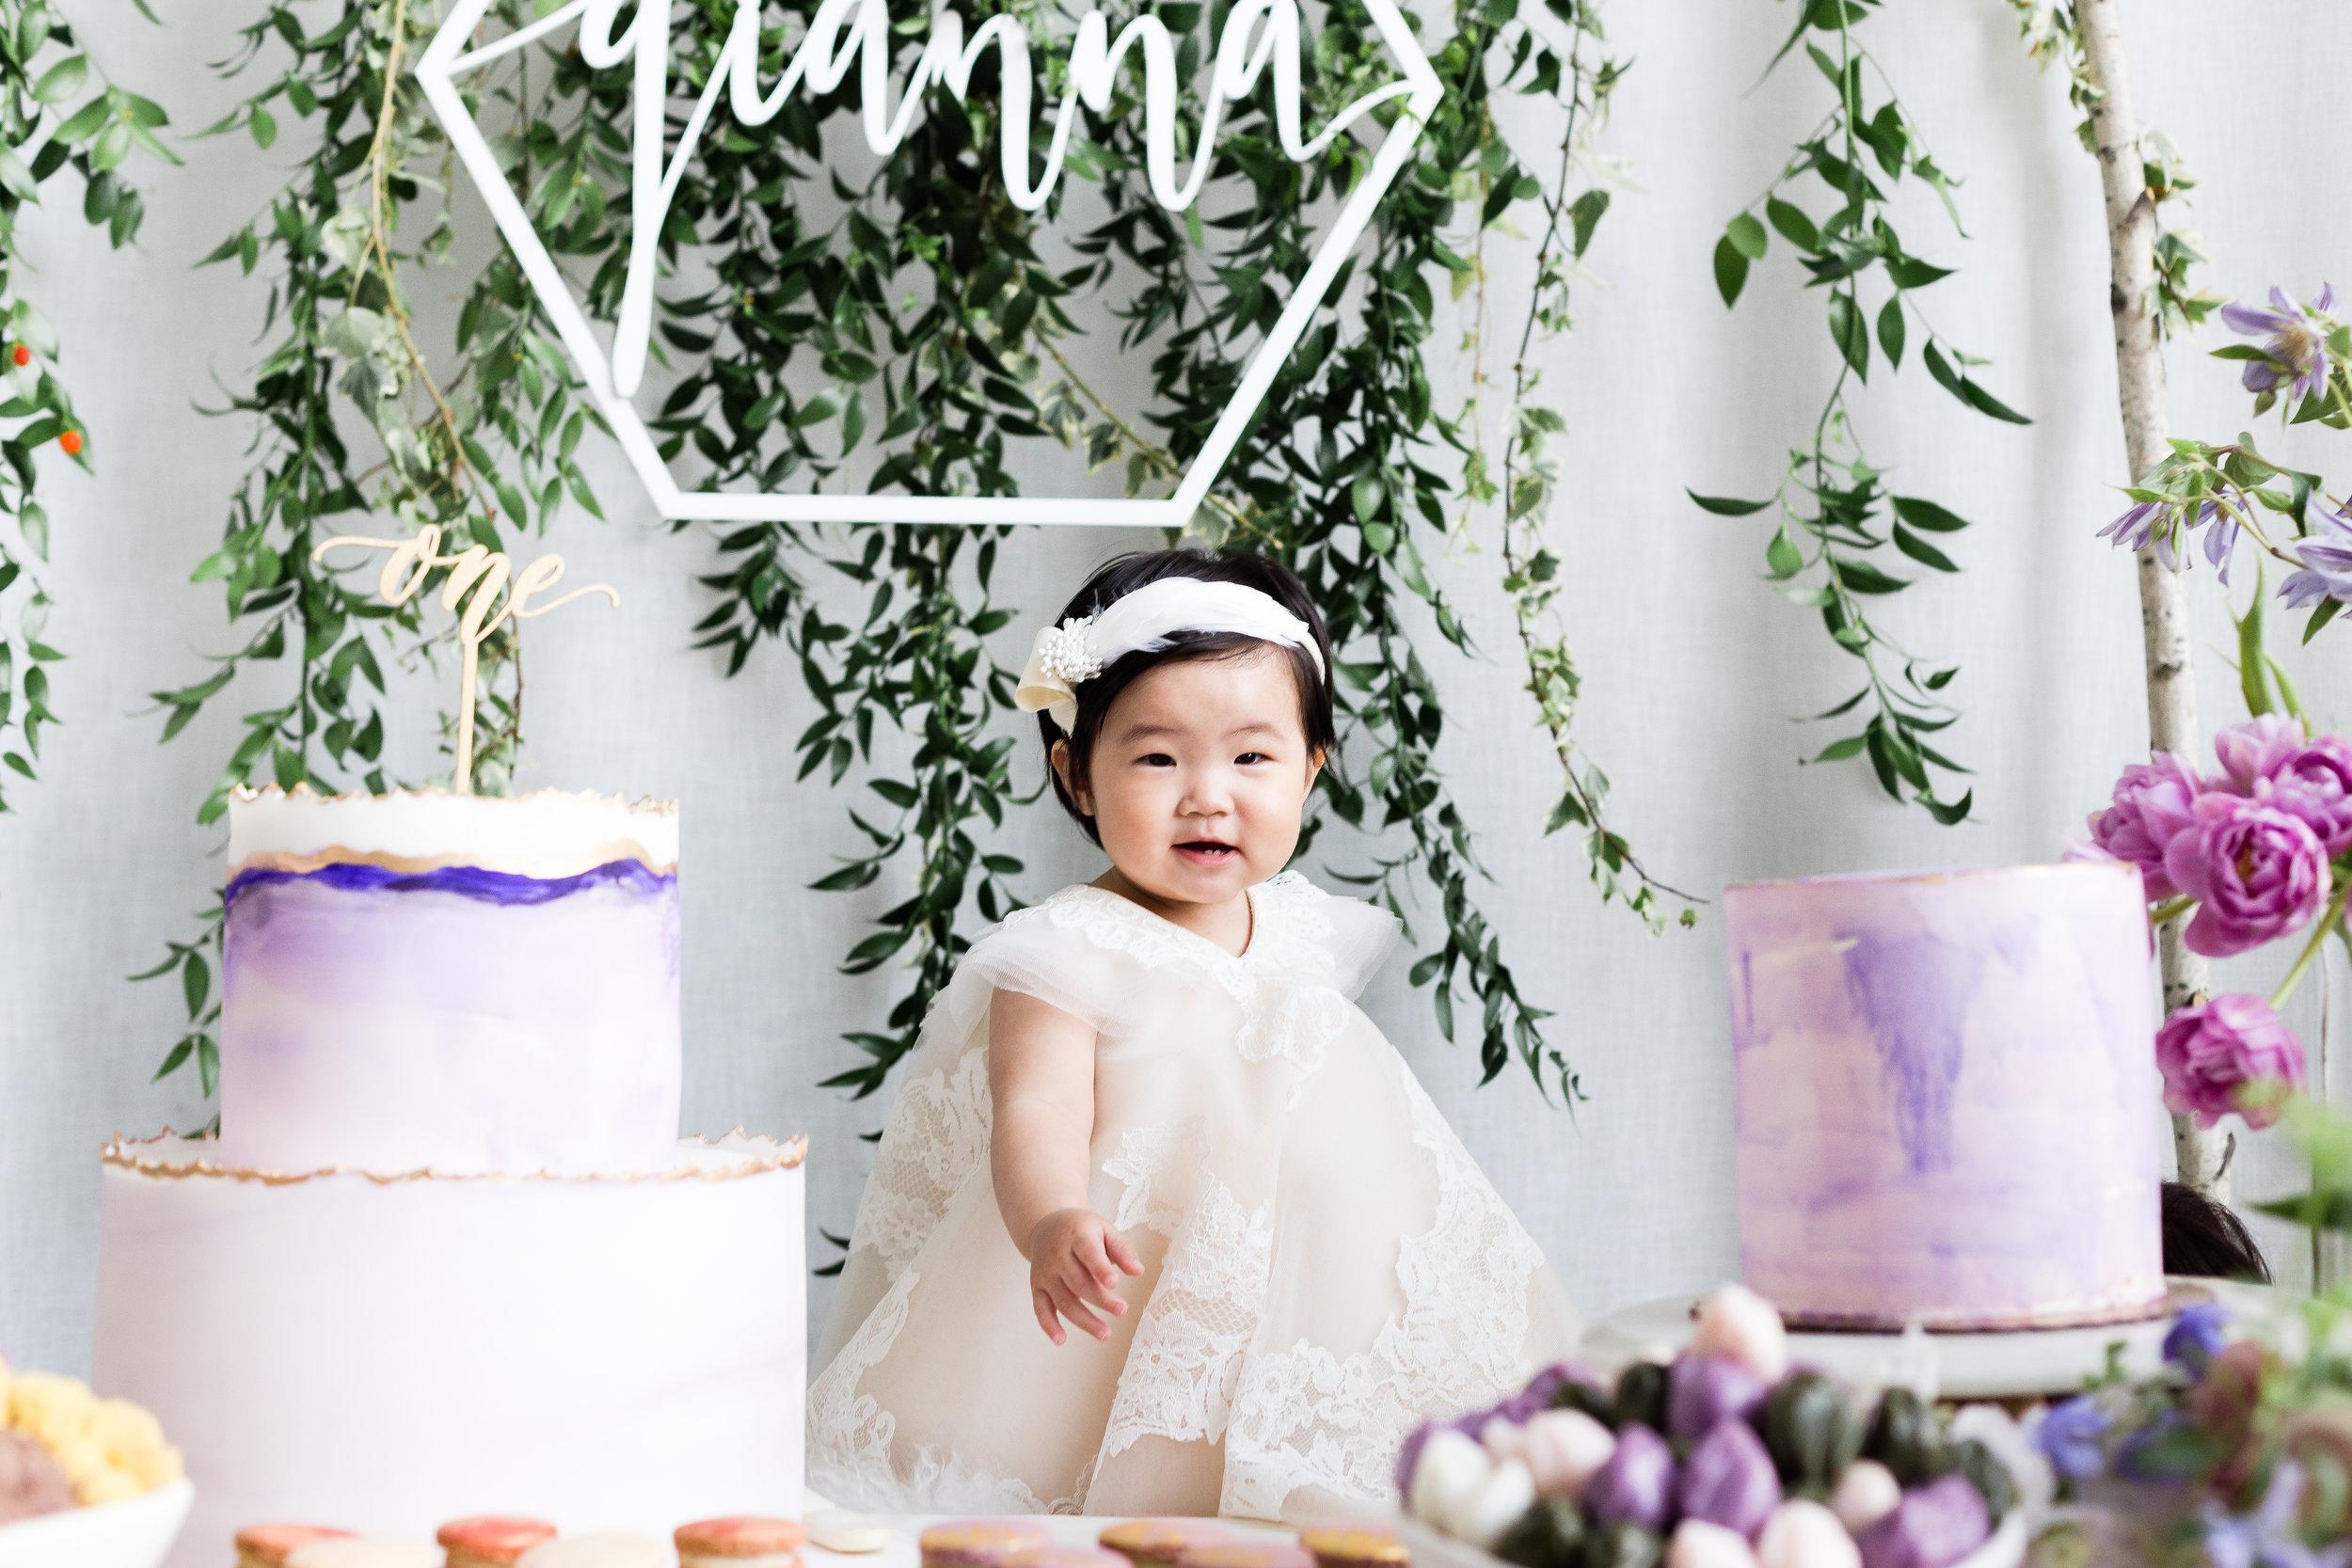 lissie_loomis_nyc_event_baby_photographer13.JPG